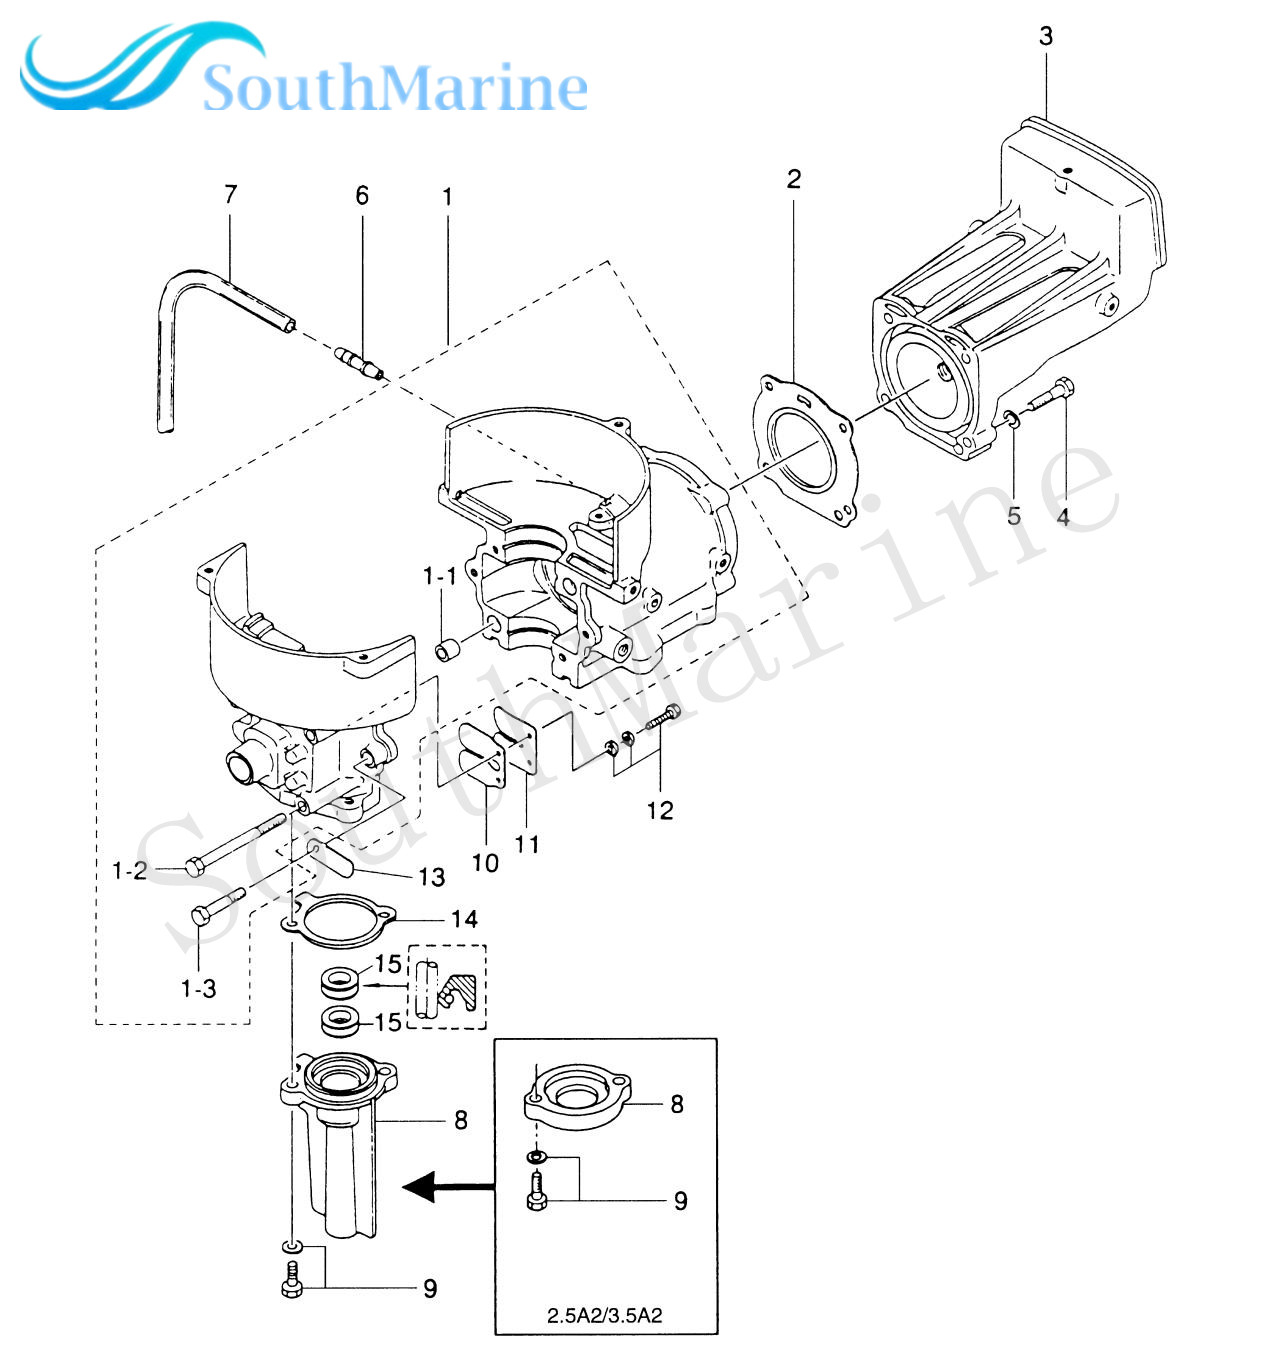 tohatsu parts manual open source user manual u2022 rh curadata co tohatsu 3.5 hp repair manual tohatsu 3.5 repair manual